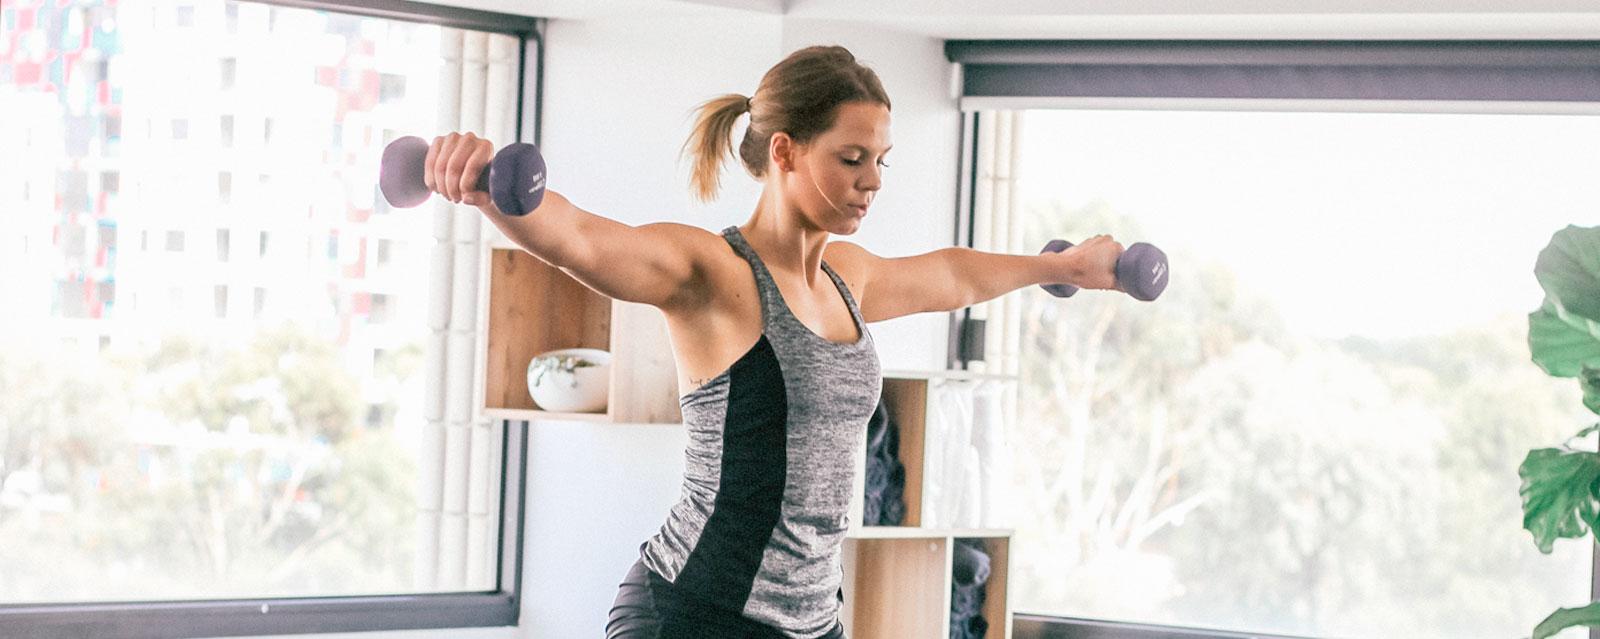 alcanzar la vida fitness